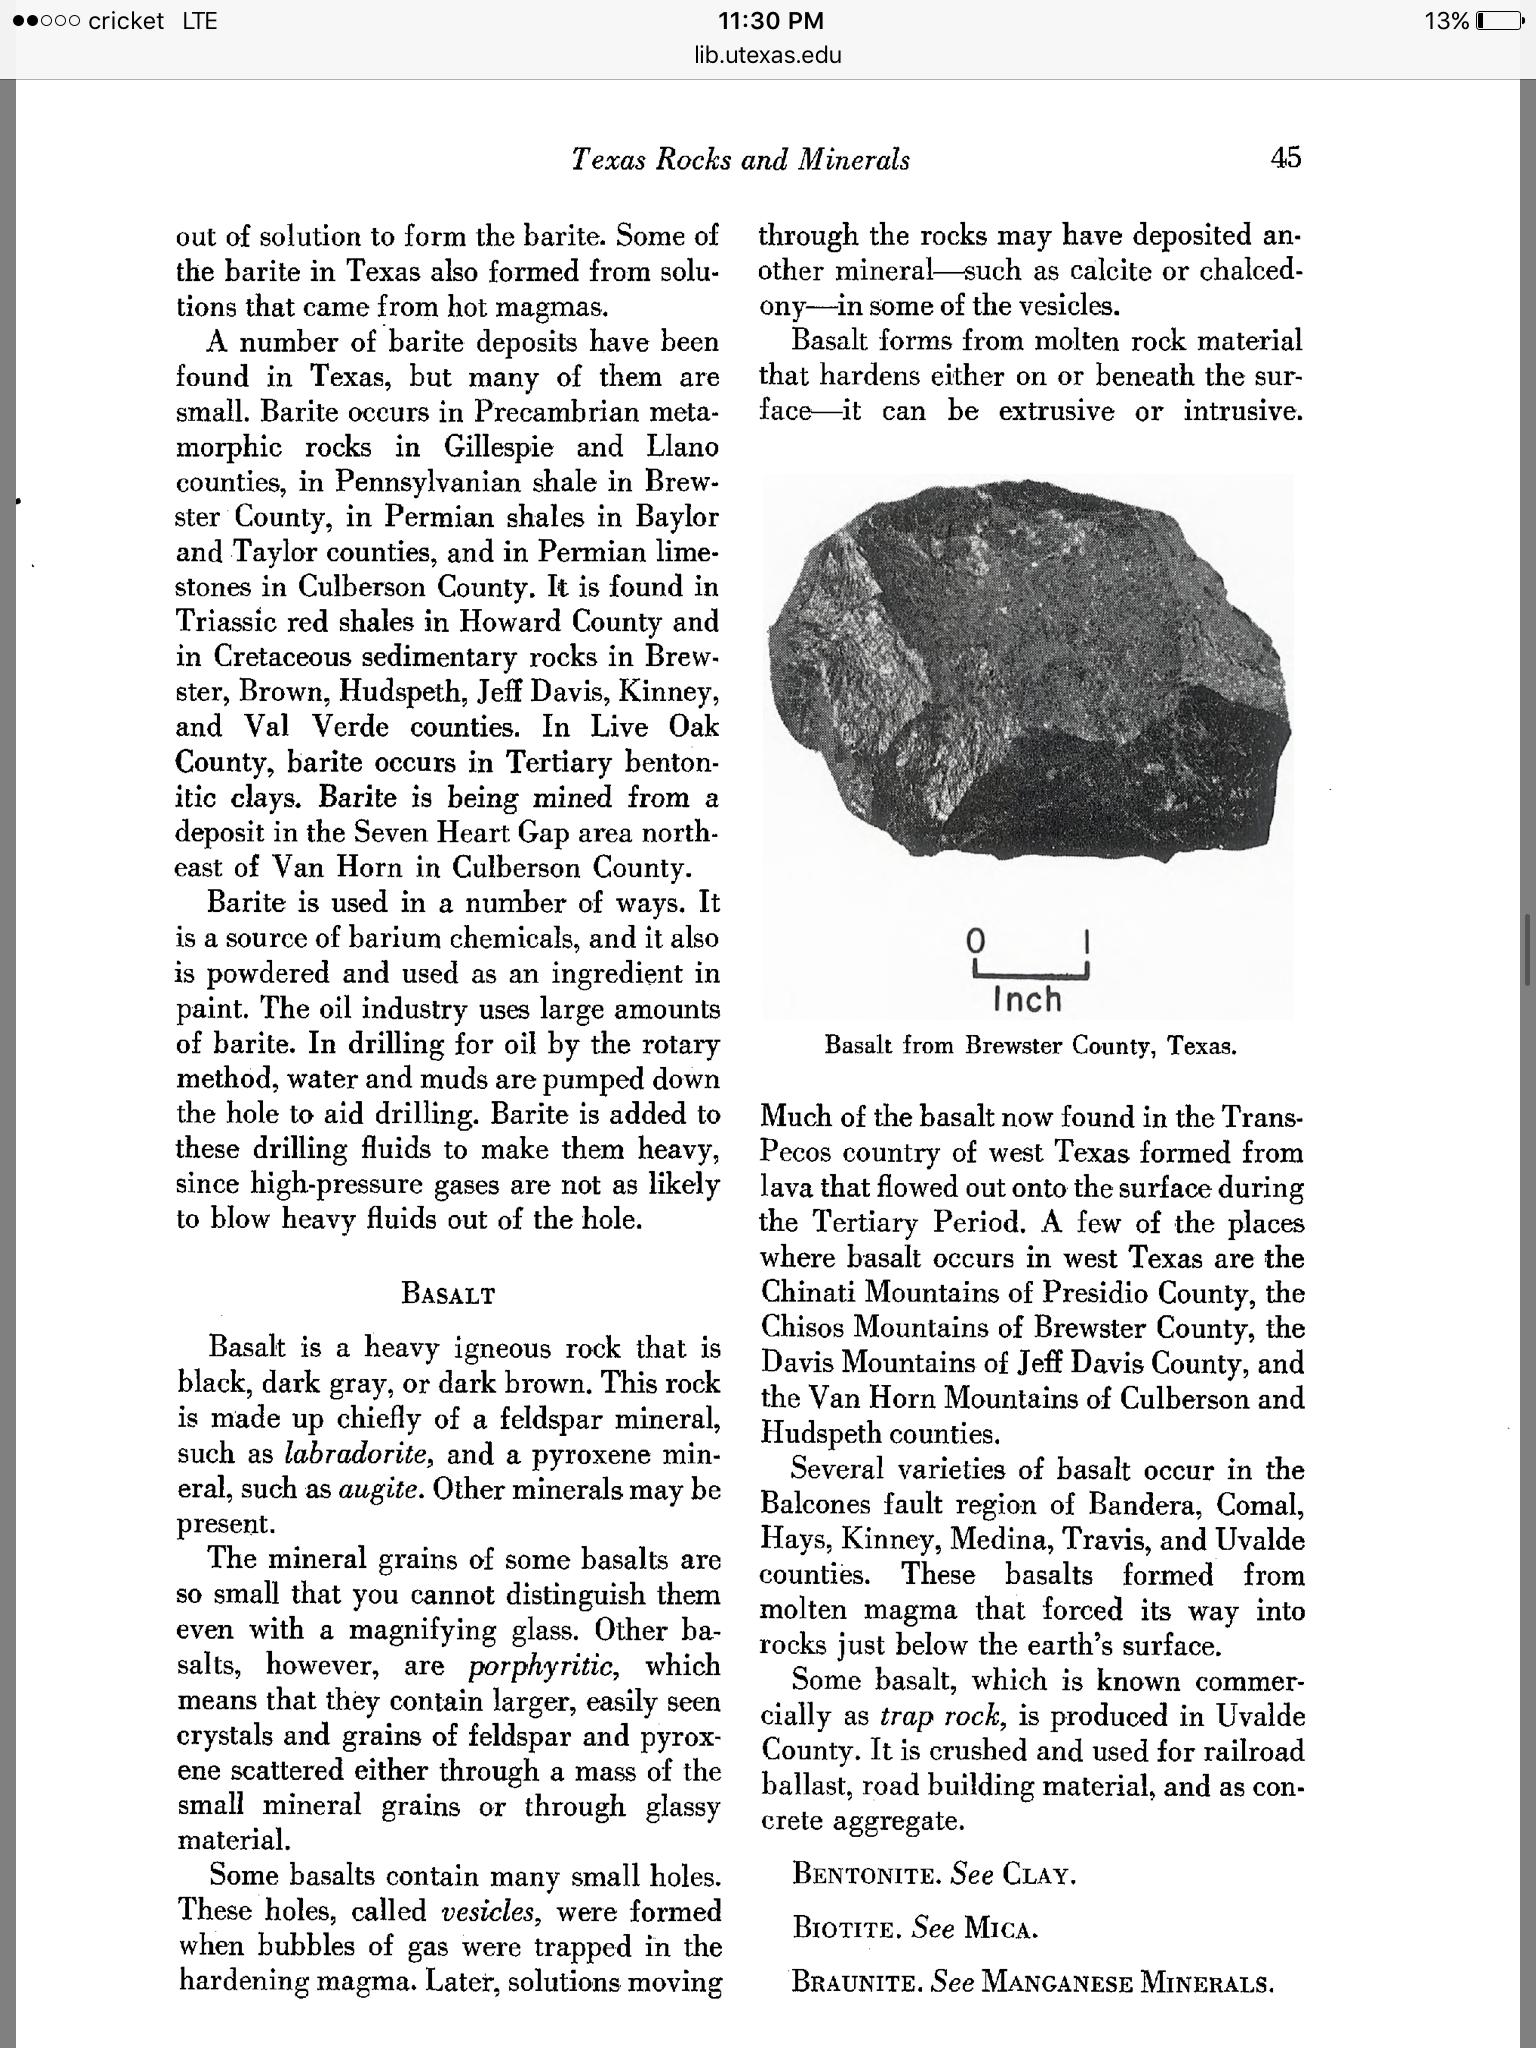 http://www.lib.utexas.edu/books/landscapes/publications/txu-oclc-1033031/txu-oclc-1033031.pdf